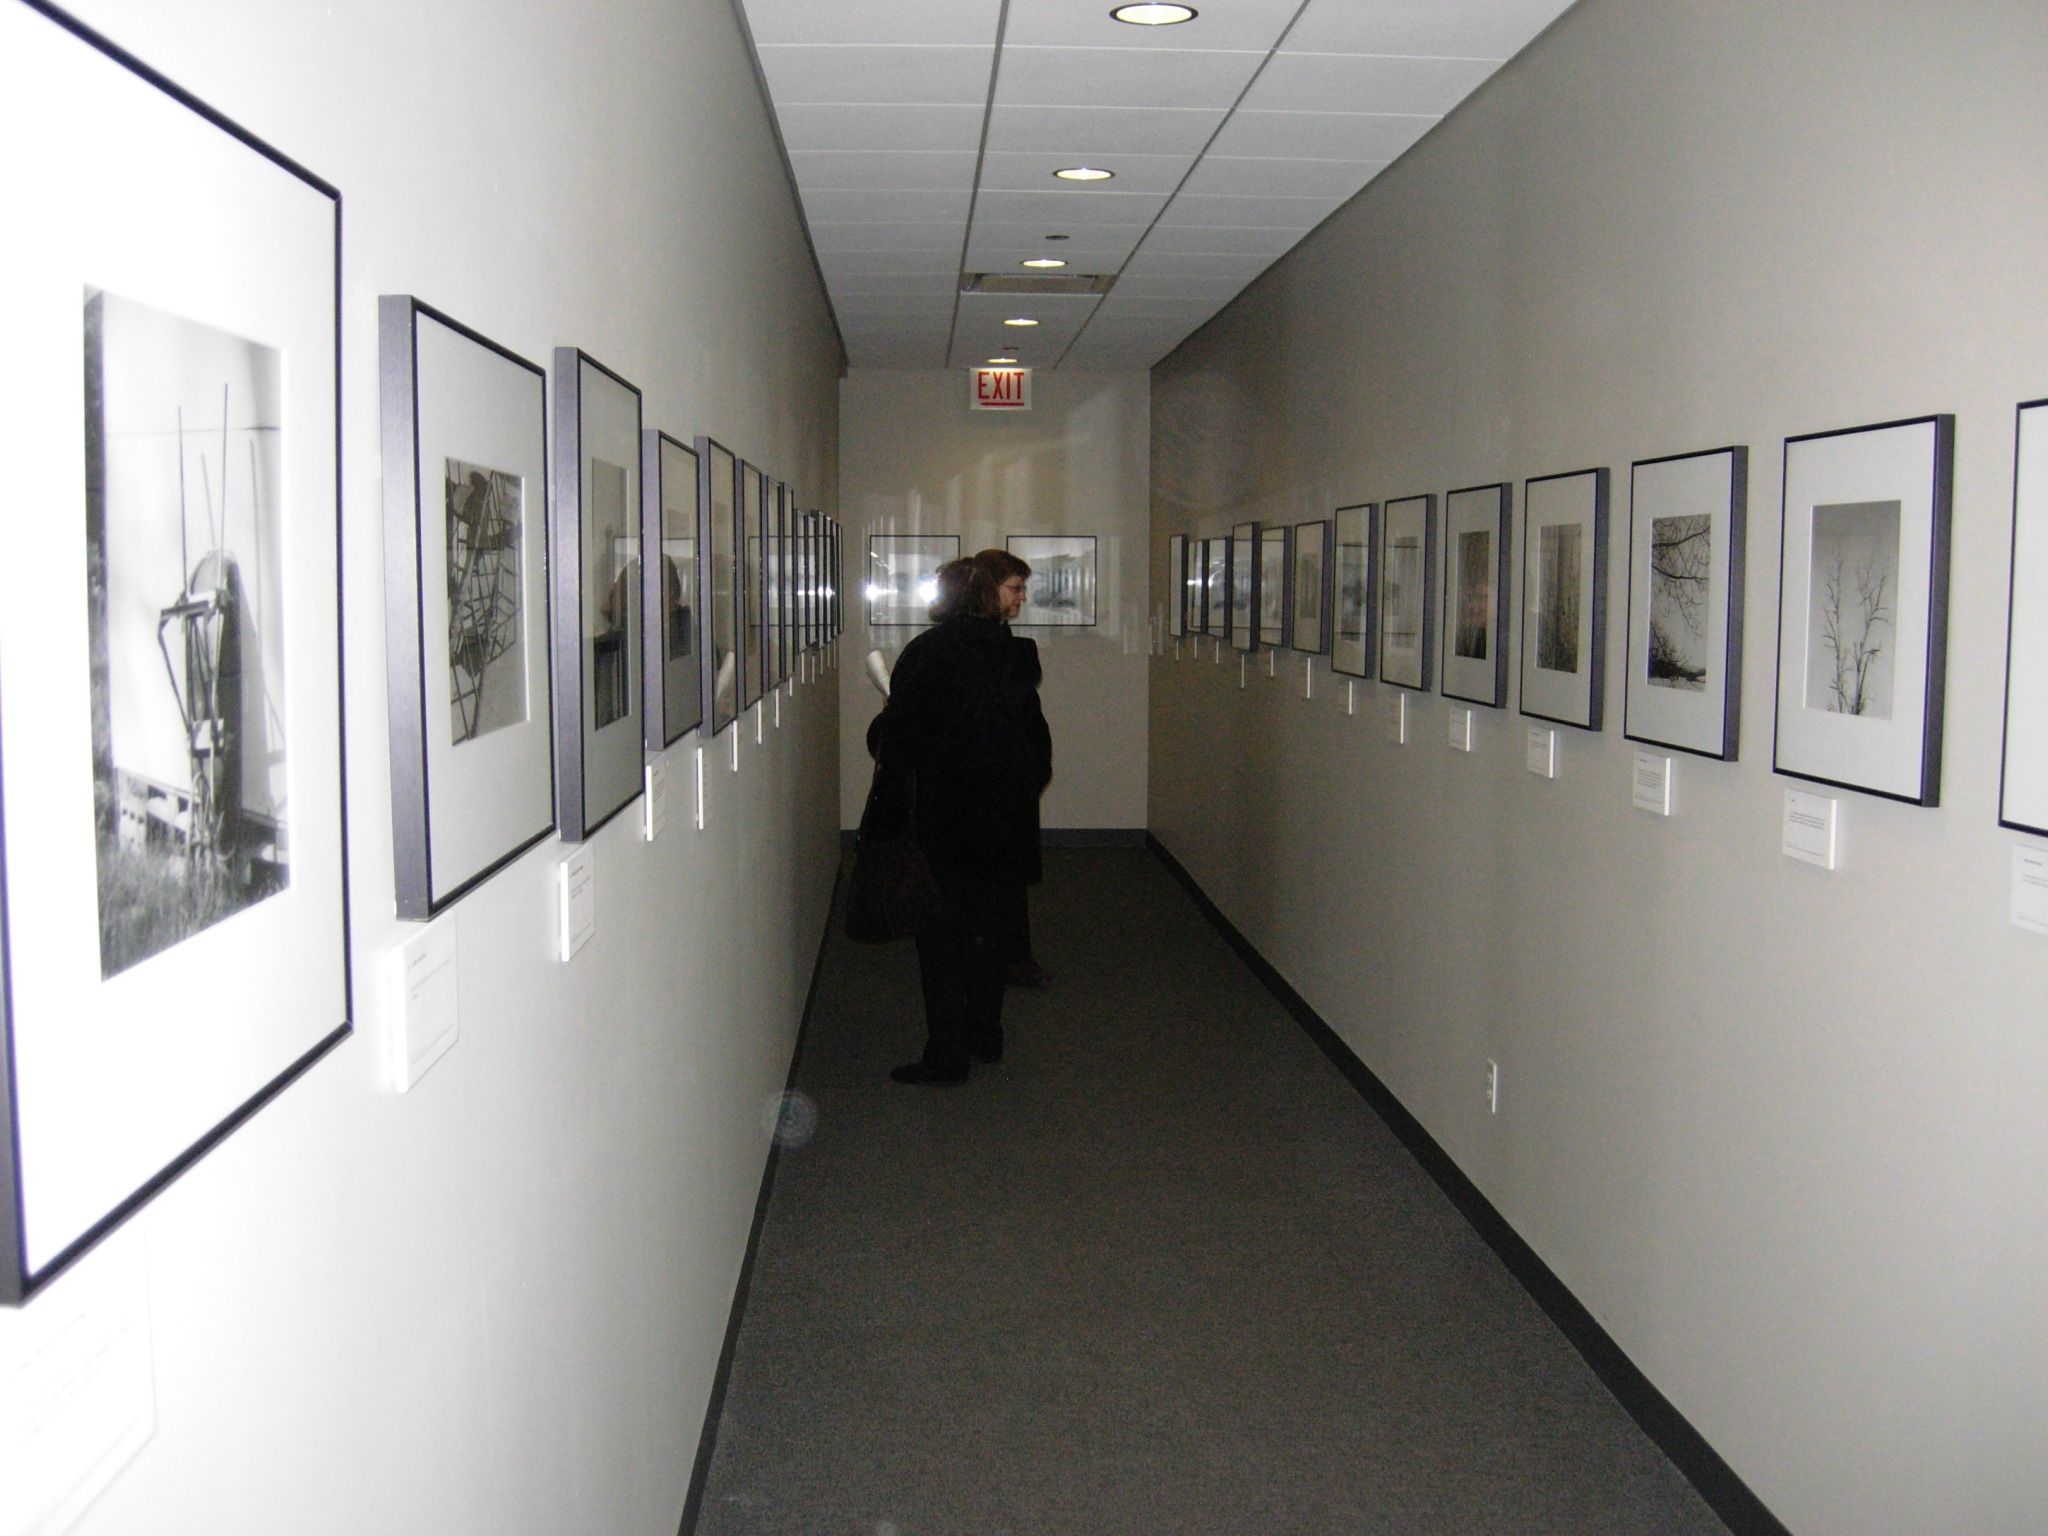 exhibit photography museum - Pesquisa Google